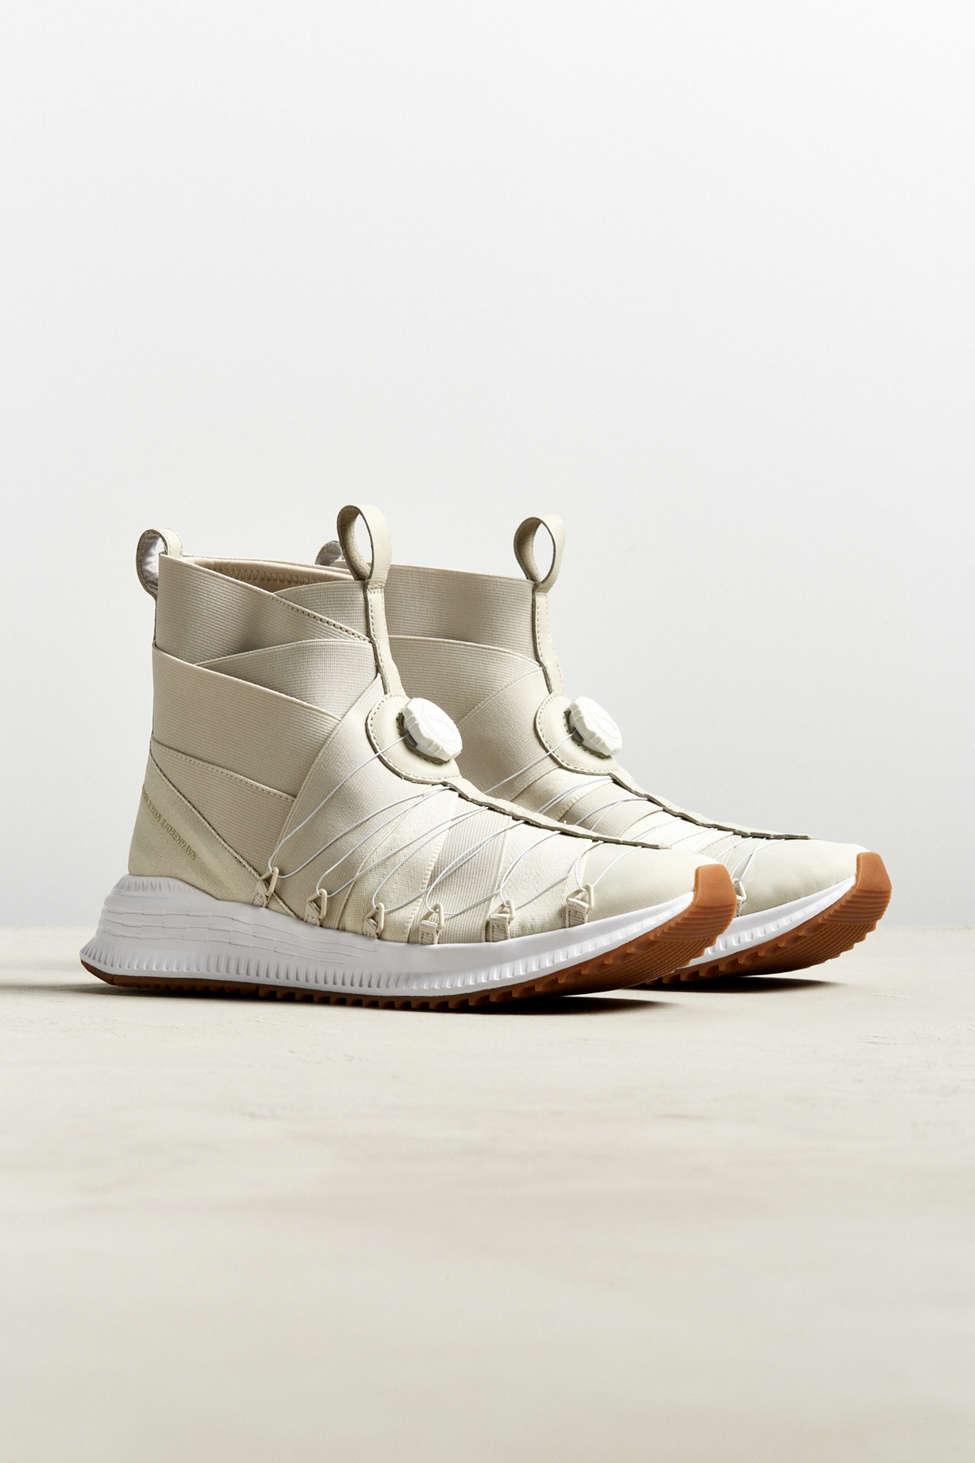 Puma X Han Kjobenhavn Tsugi Disc Sneaker